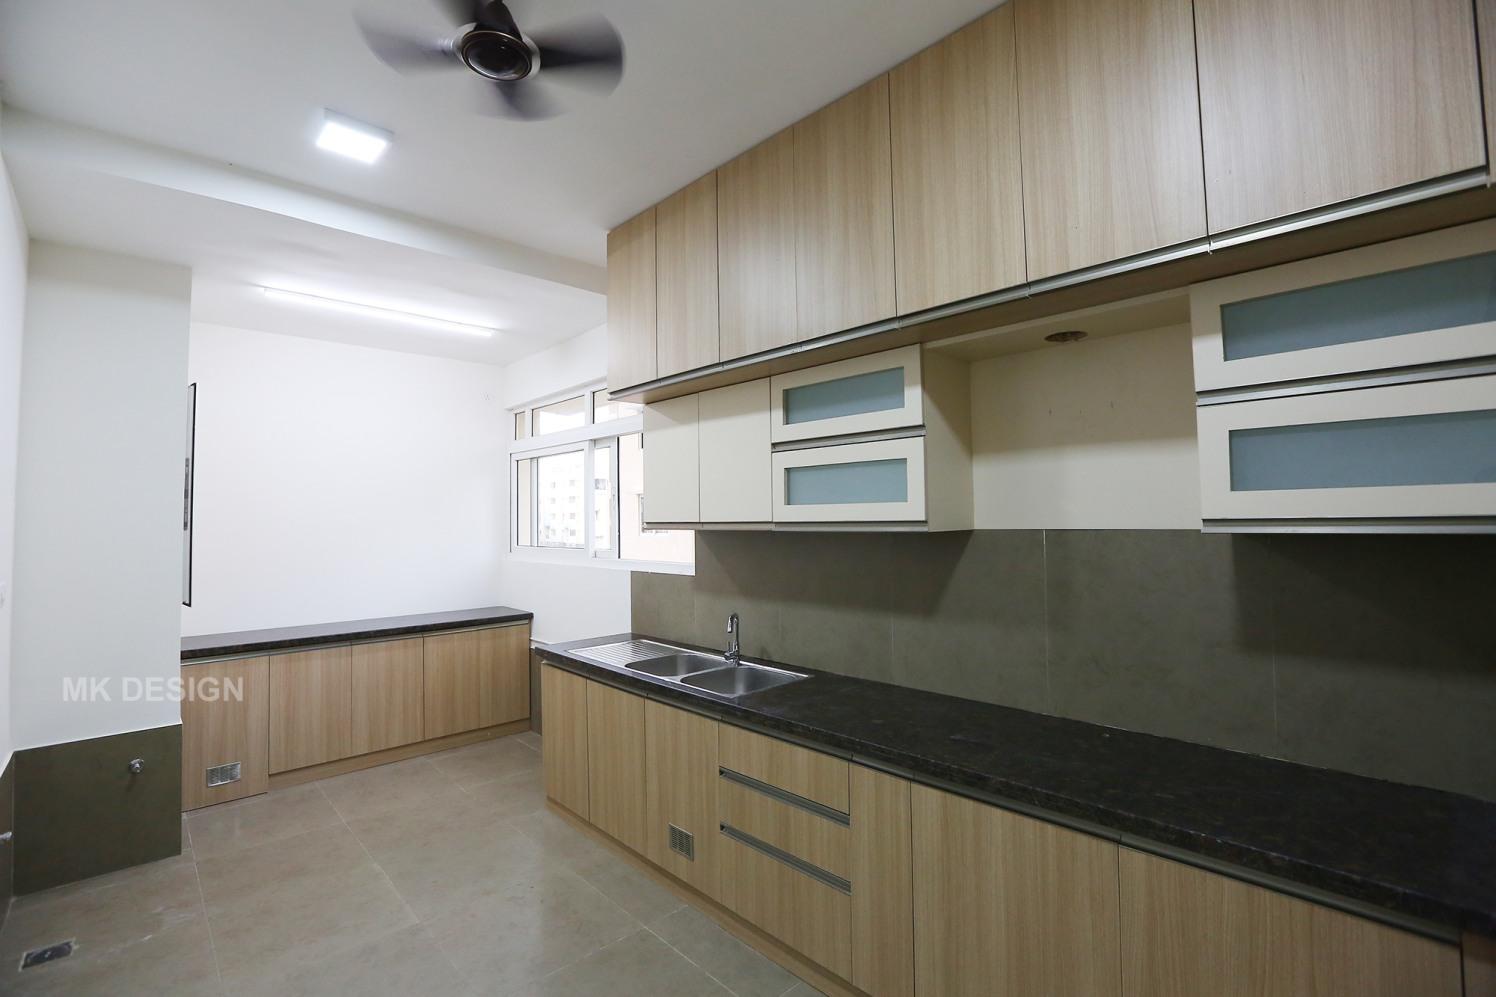 Horizontal Abode by MK Design Architects And Interior Consultants Modular-kitchen Modern | Interior Design Photos & Ideas